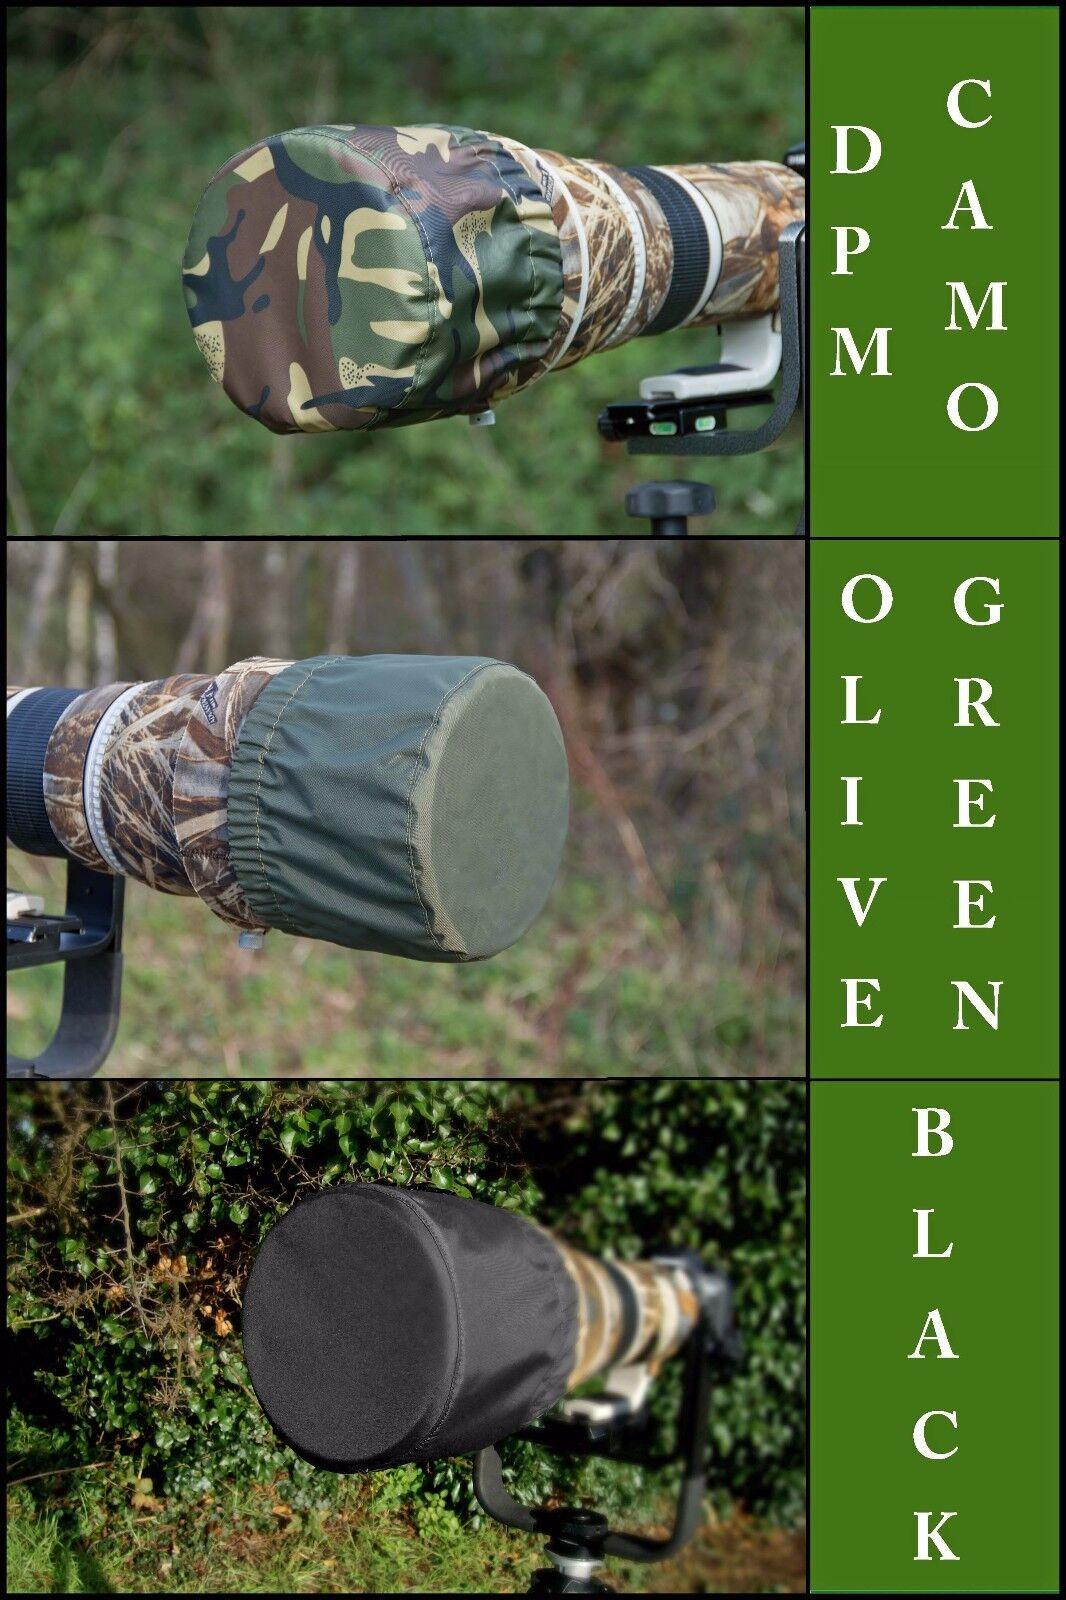 Waterproof Lens Hood End Cap for Sigma 150-500 mm f/5-6.3 DG OS HSM, 3 colours